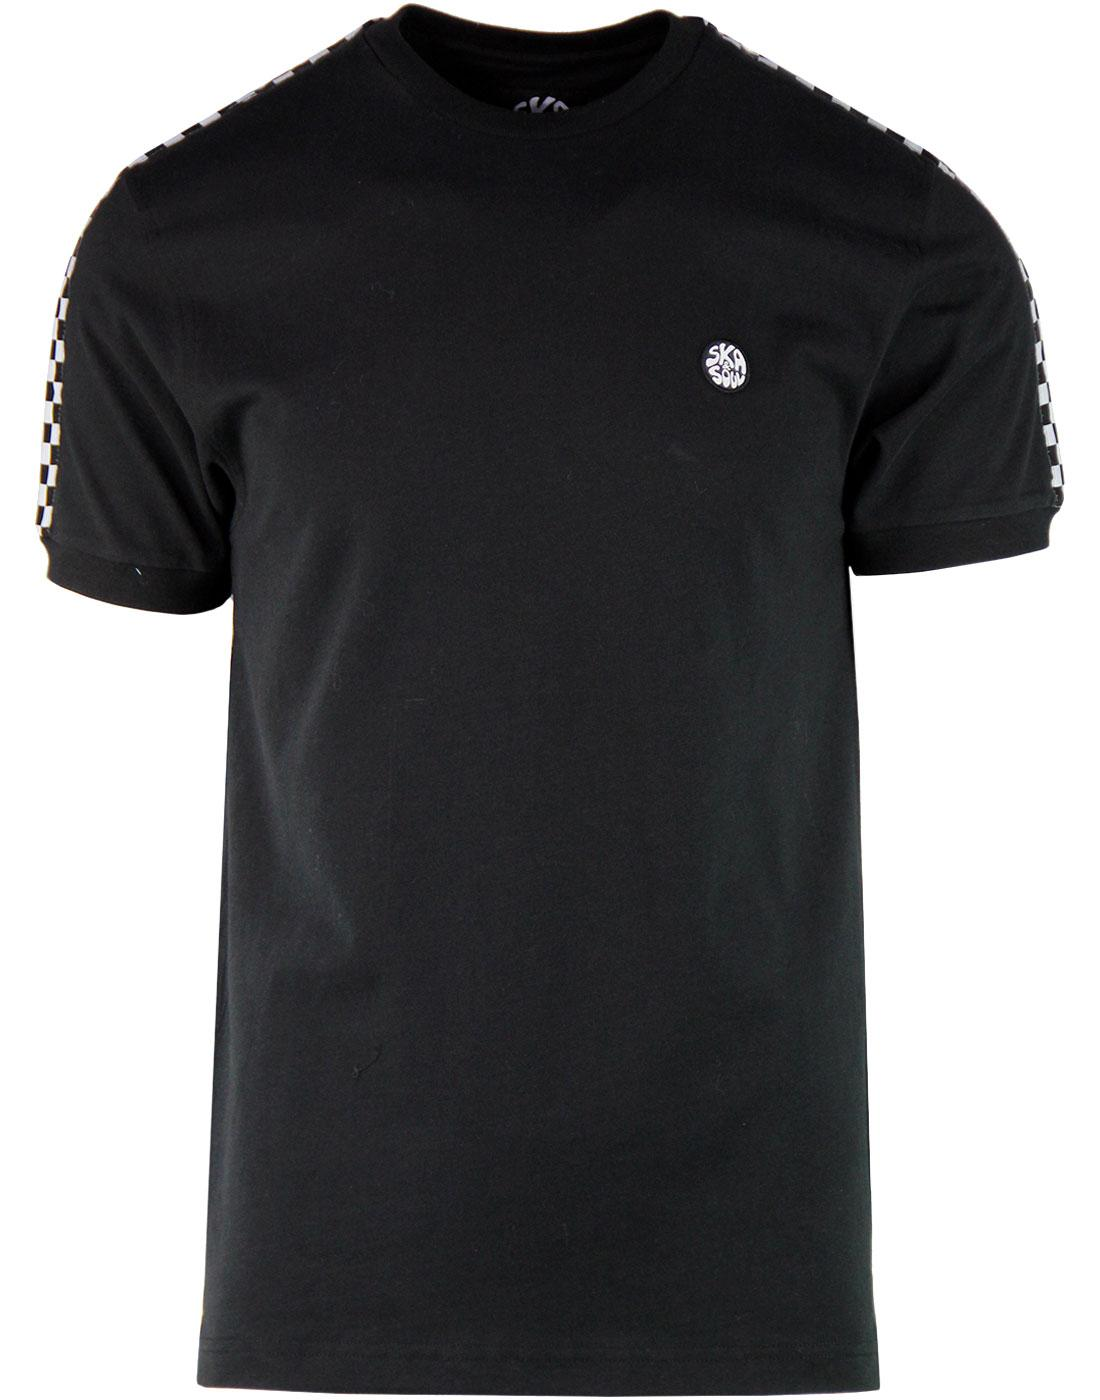 SKA & SOUL Men's Checkerboard Tape Sleeve T-shirt